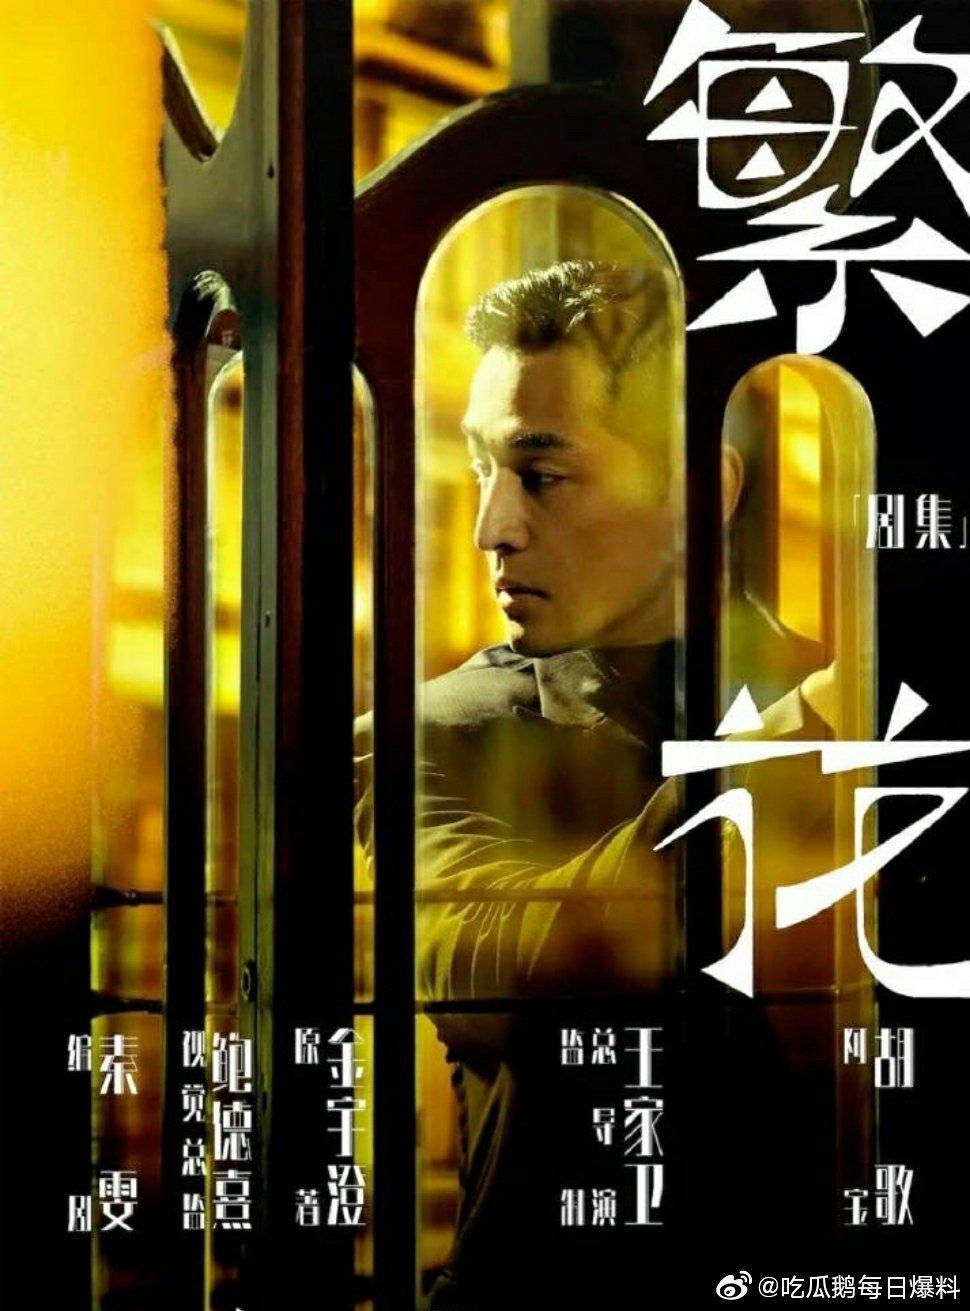 Poster của Hồ Ca trong phim Phồn hoa.